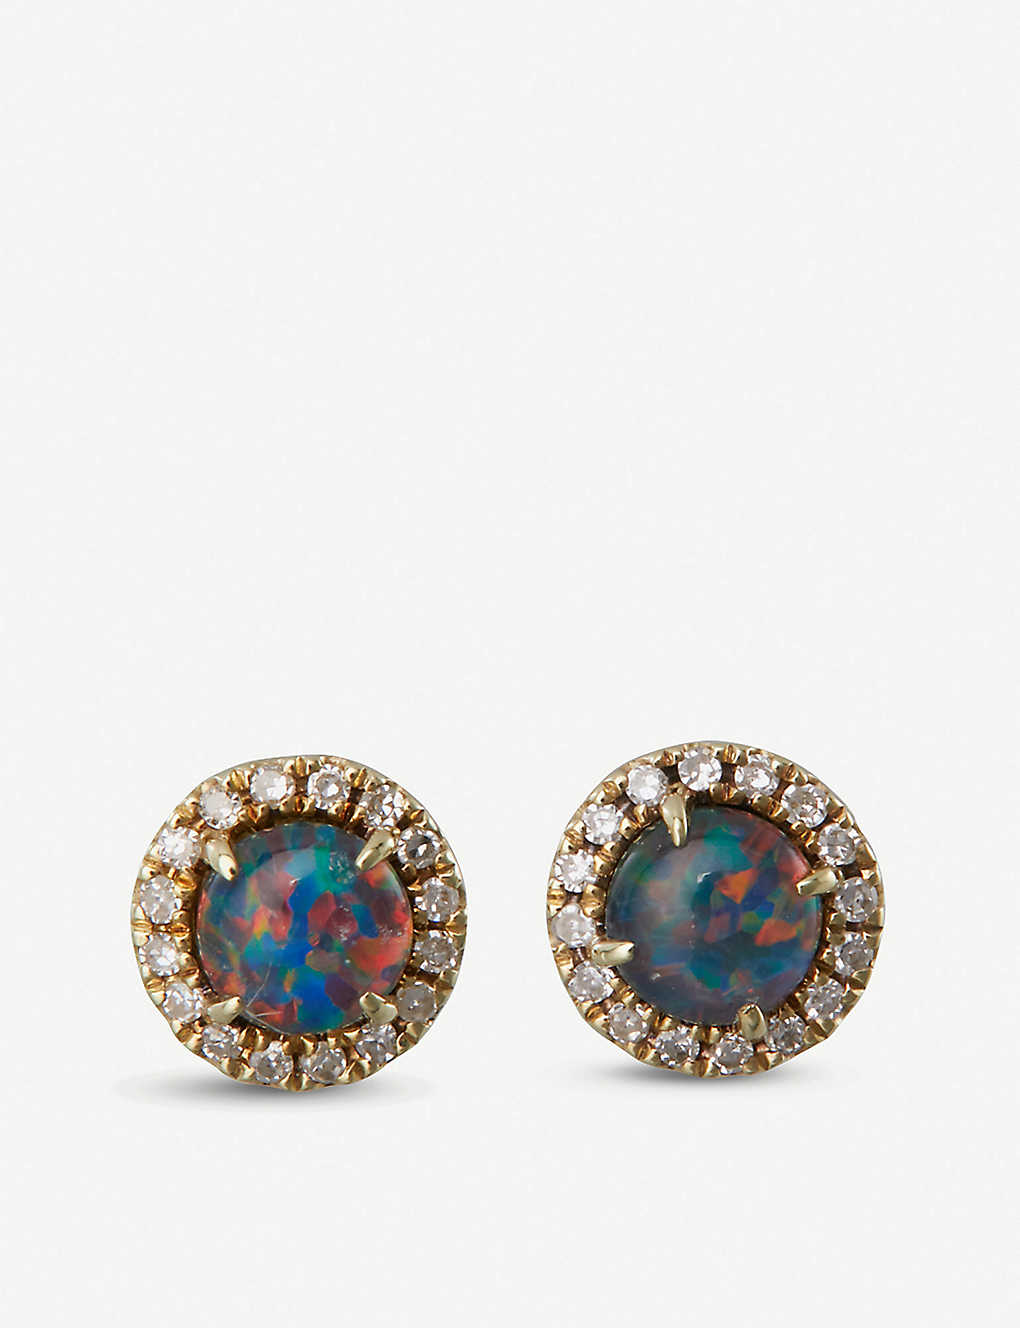 33d754bcbb01f THE ALKEMISTRY - Meira T 14ct yellow gold, opal and diamond stud ...